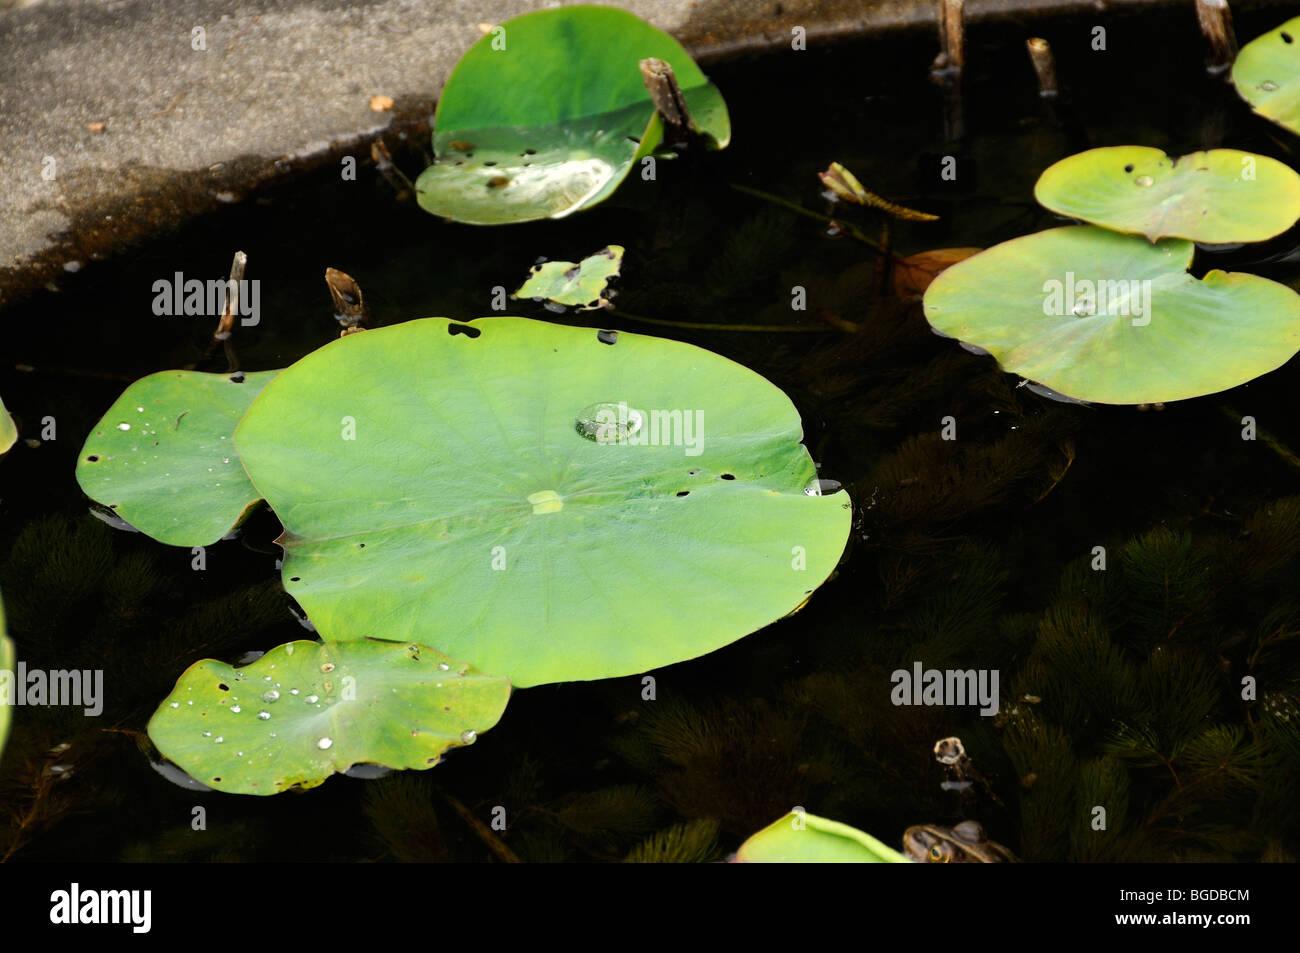 Lotus leaves, lotus effect, Kyoto, Japan, East Asia, Asia Stock Photo